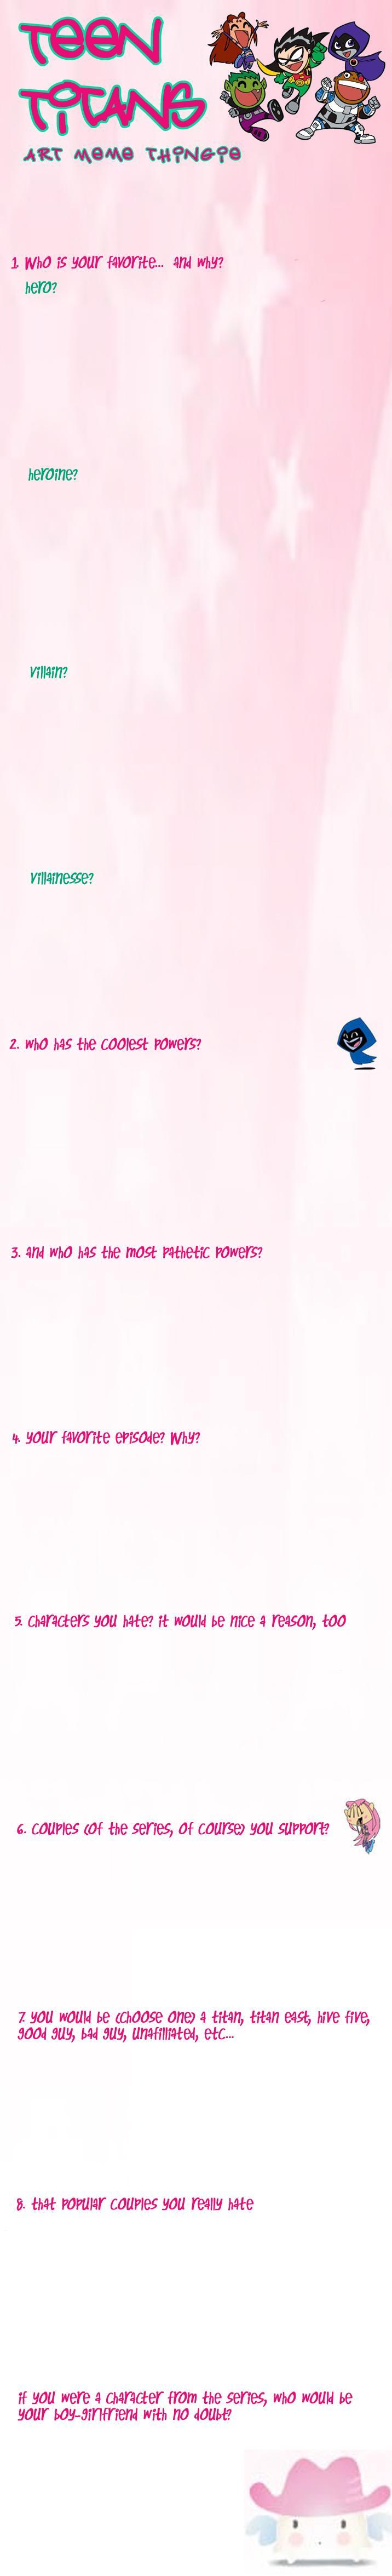 Teen Titans MEME by Smellerbee